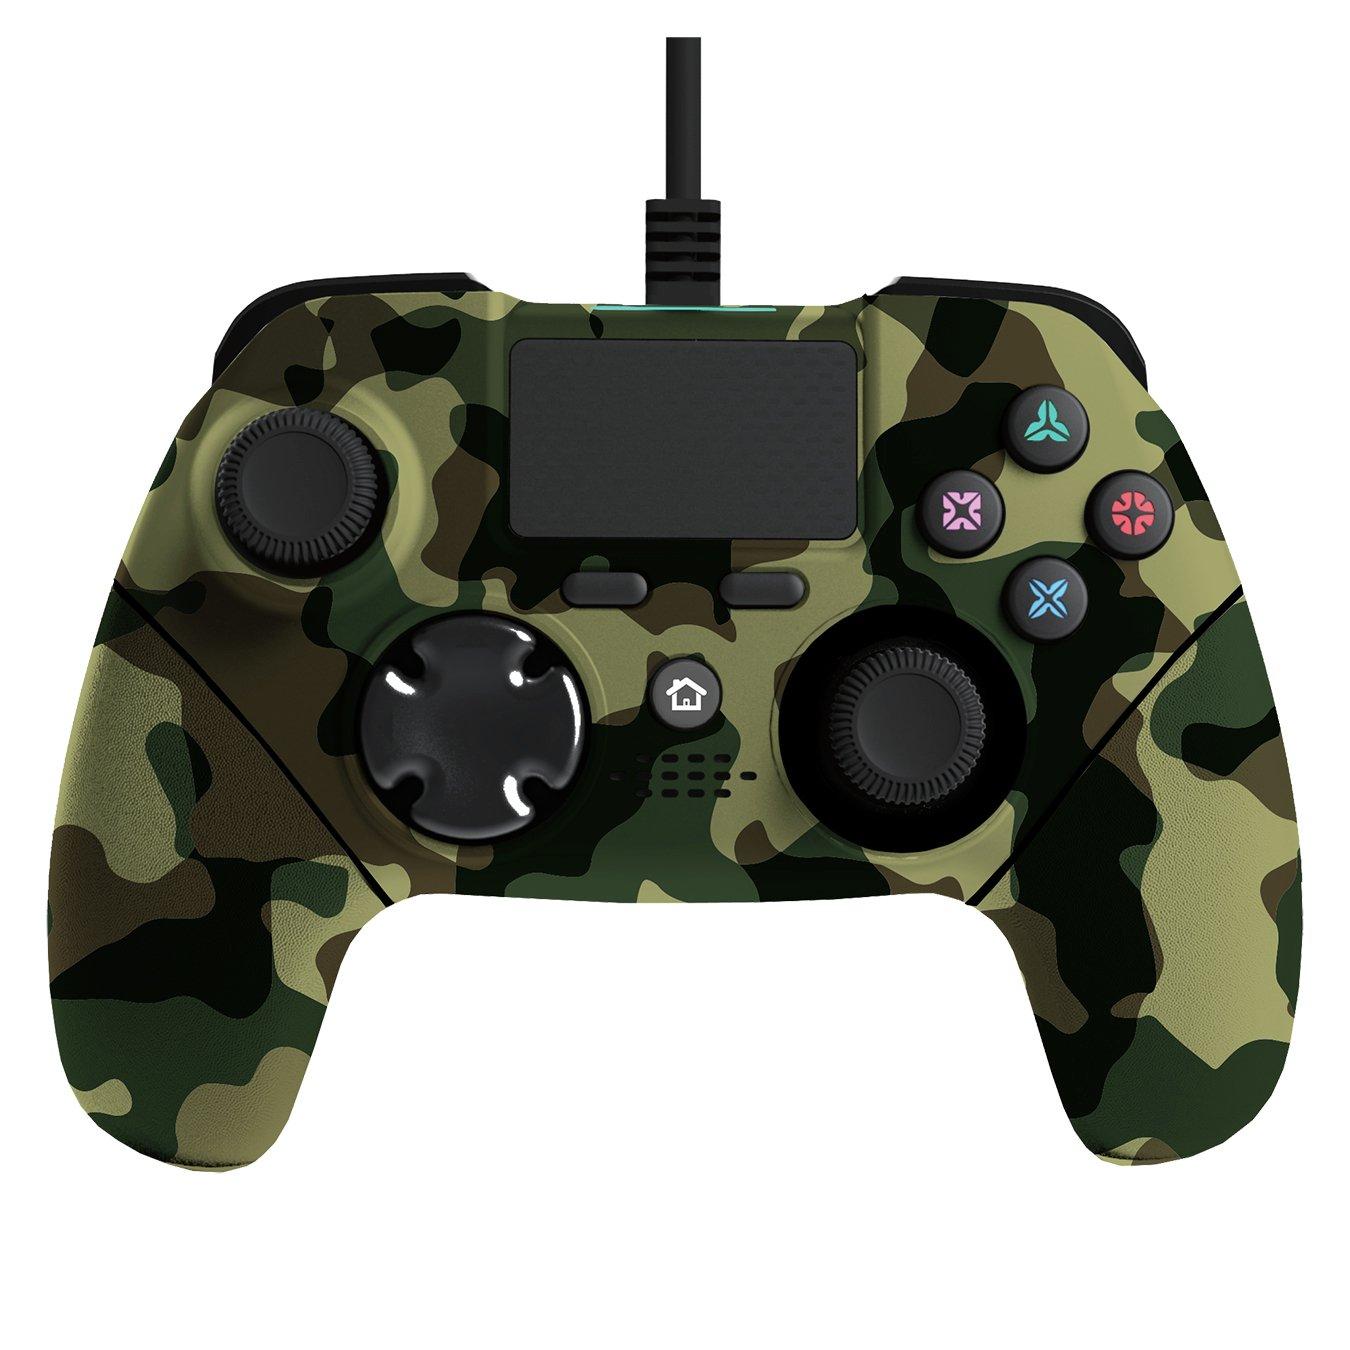 Mayhem MK1 PS4 Controller - Green Camo Pre-Order